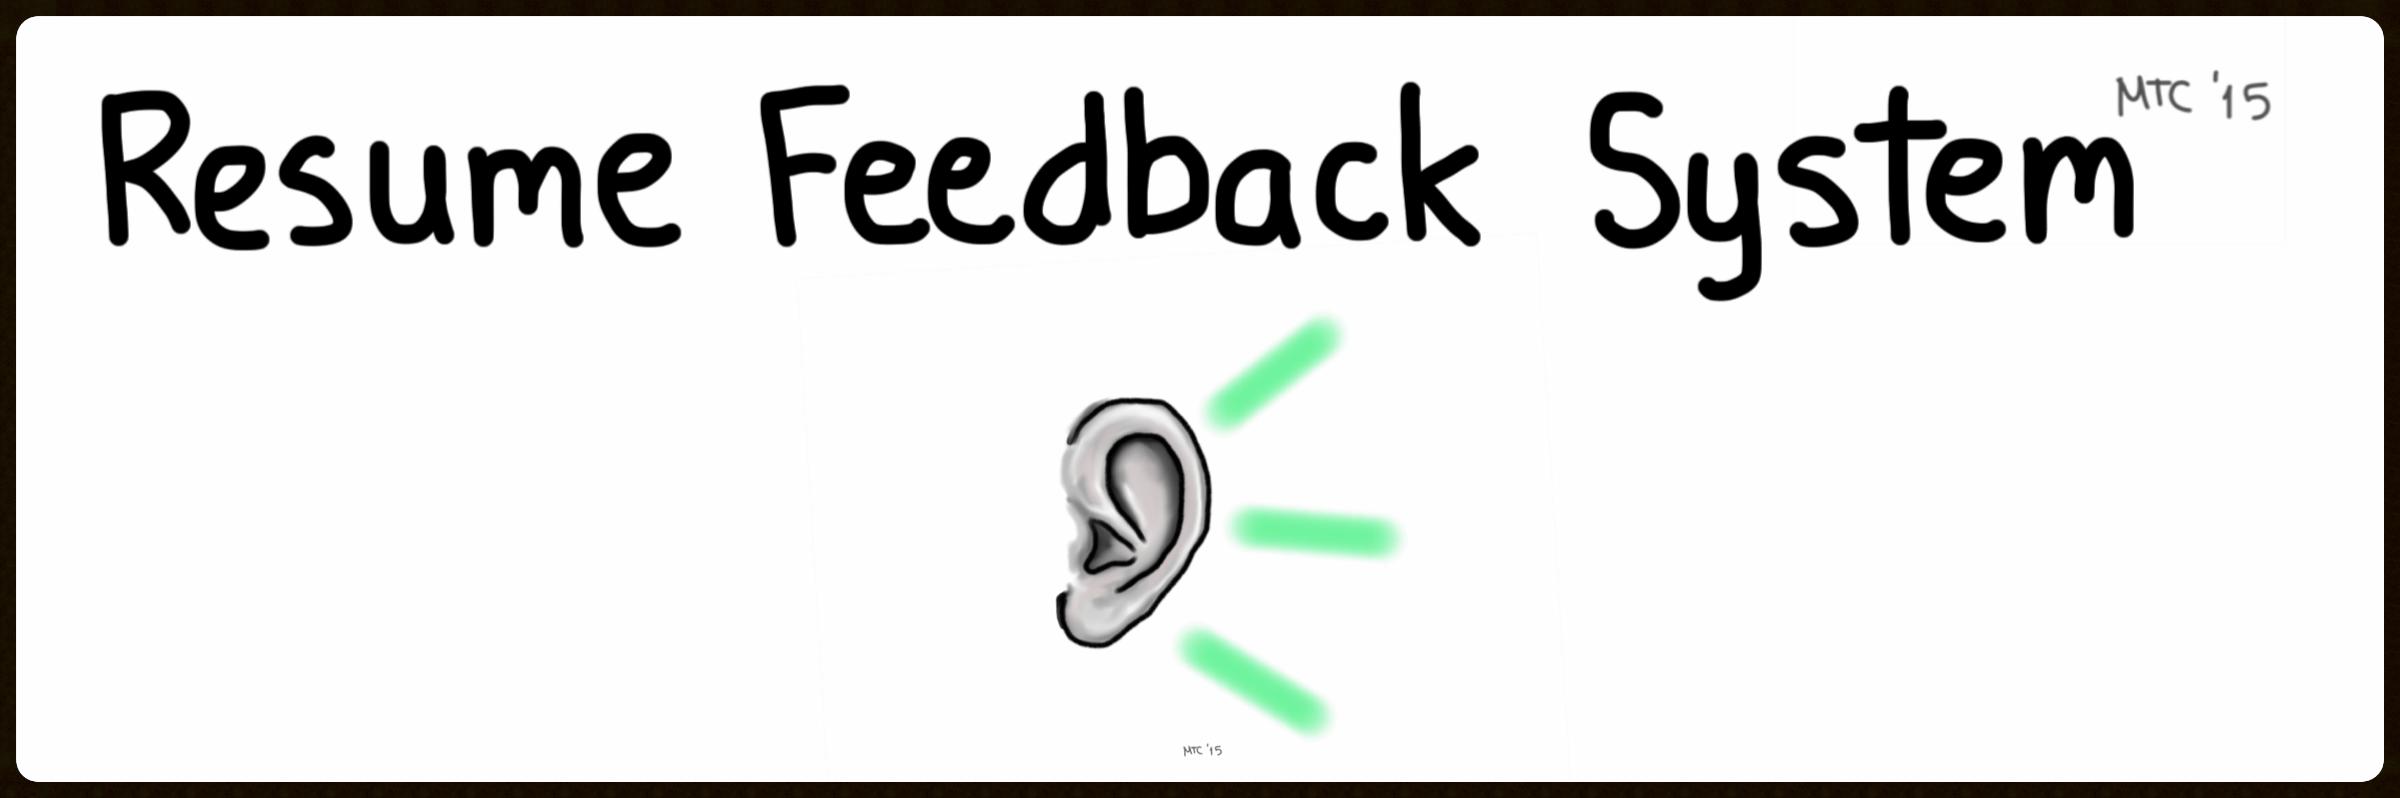 Resume Feedback System Tutorial Video